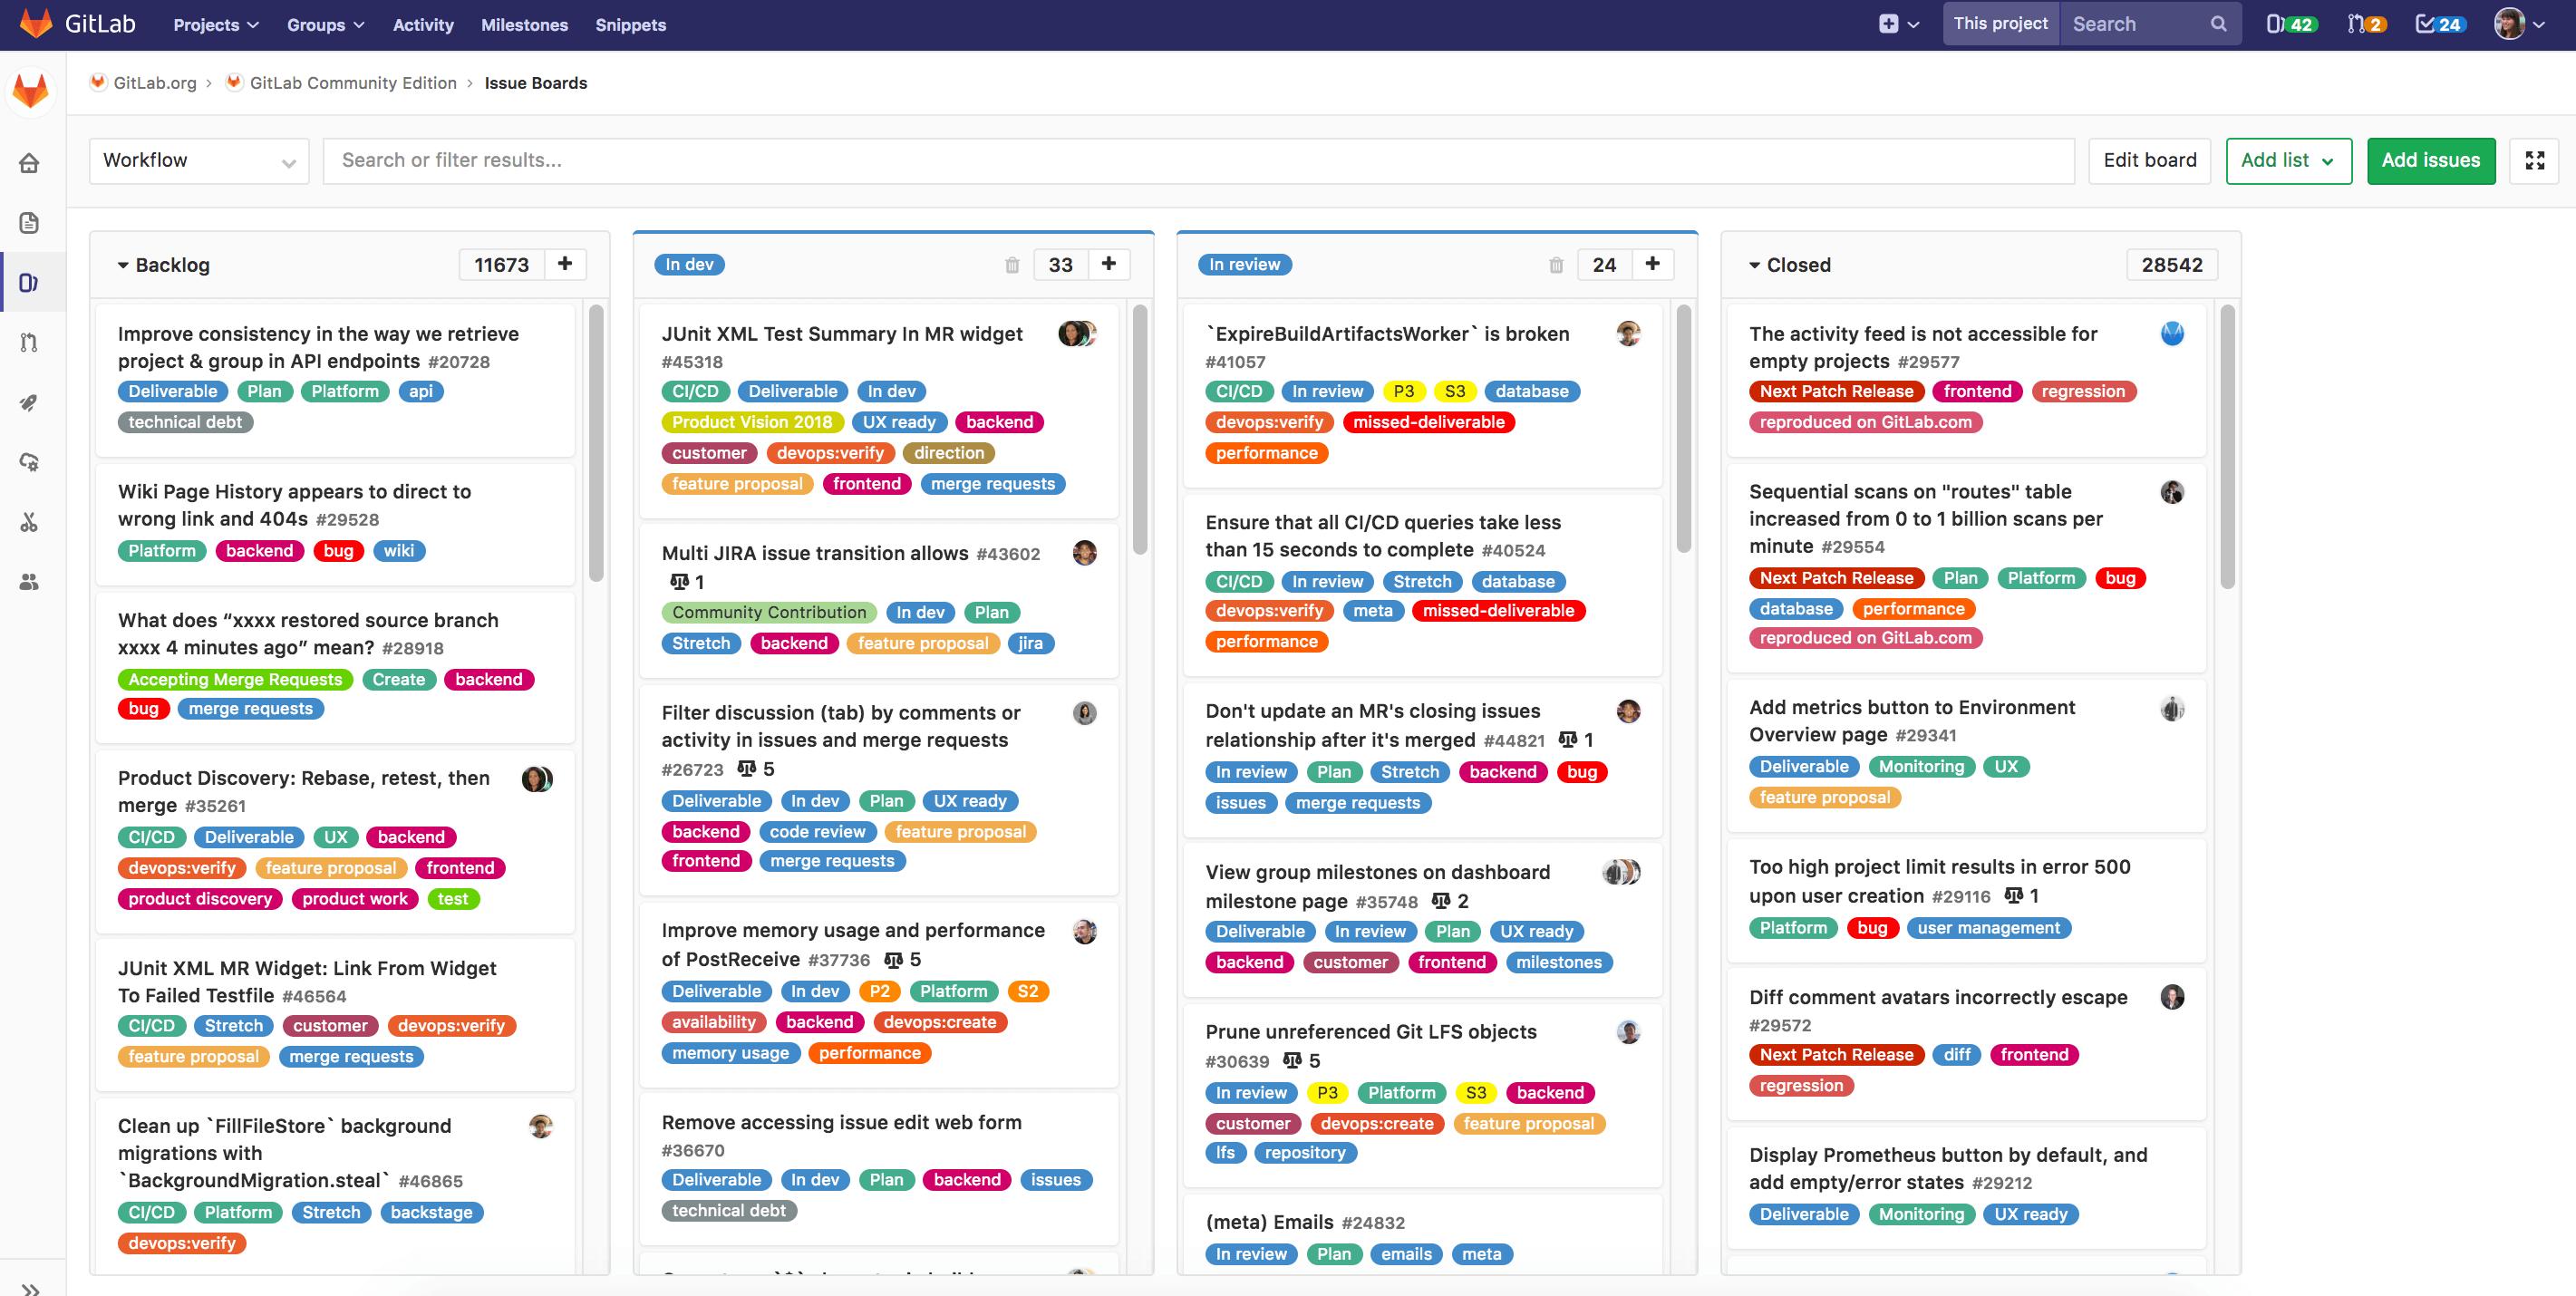 GitLab Board